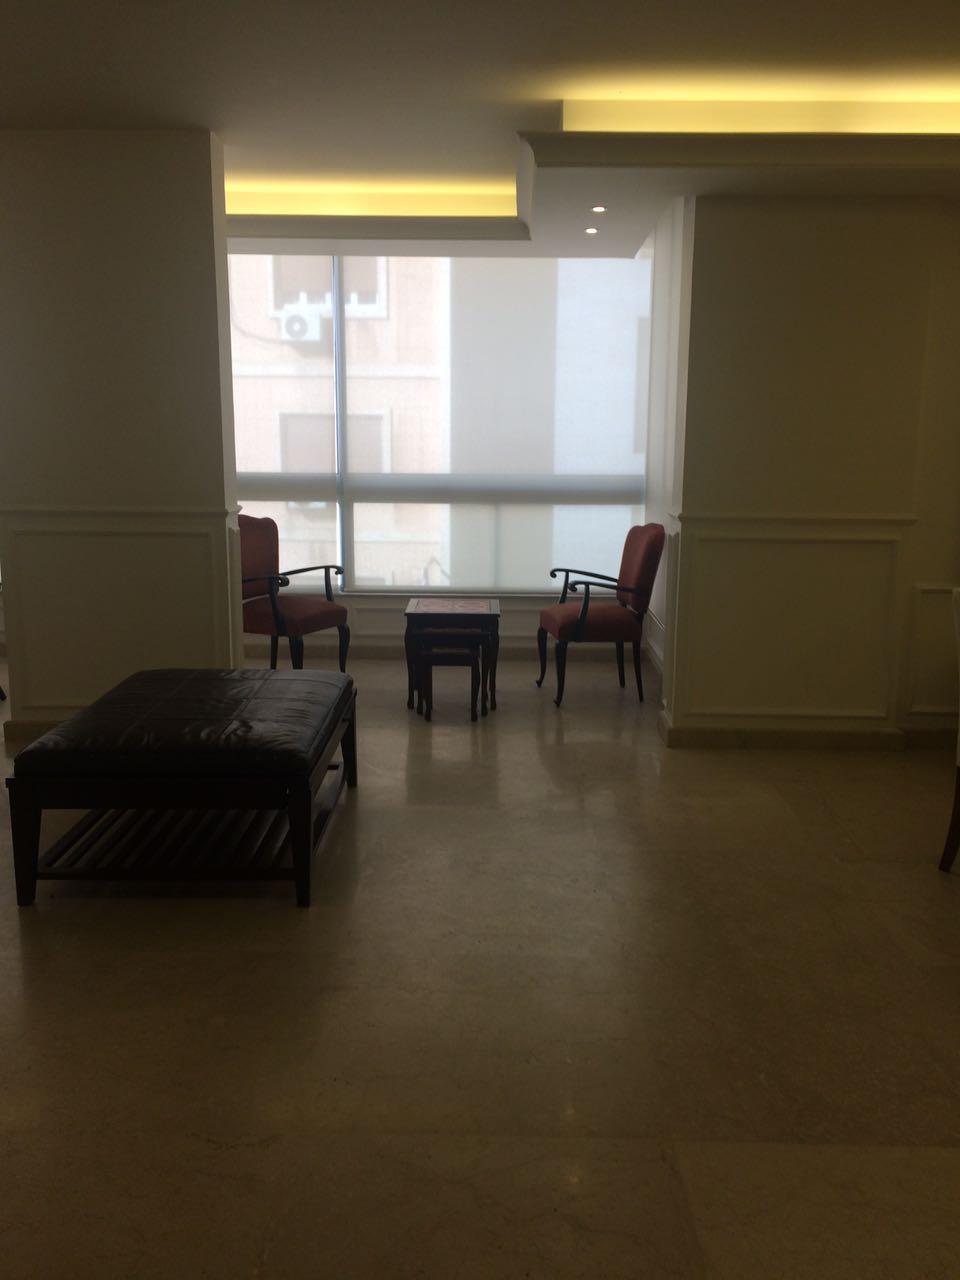 Apartment for sale in verdun beirut lebanon, buy sell properties in verdun beirut lebanon, real estate in lebanon